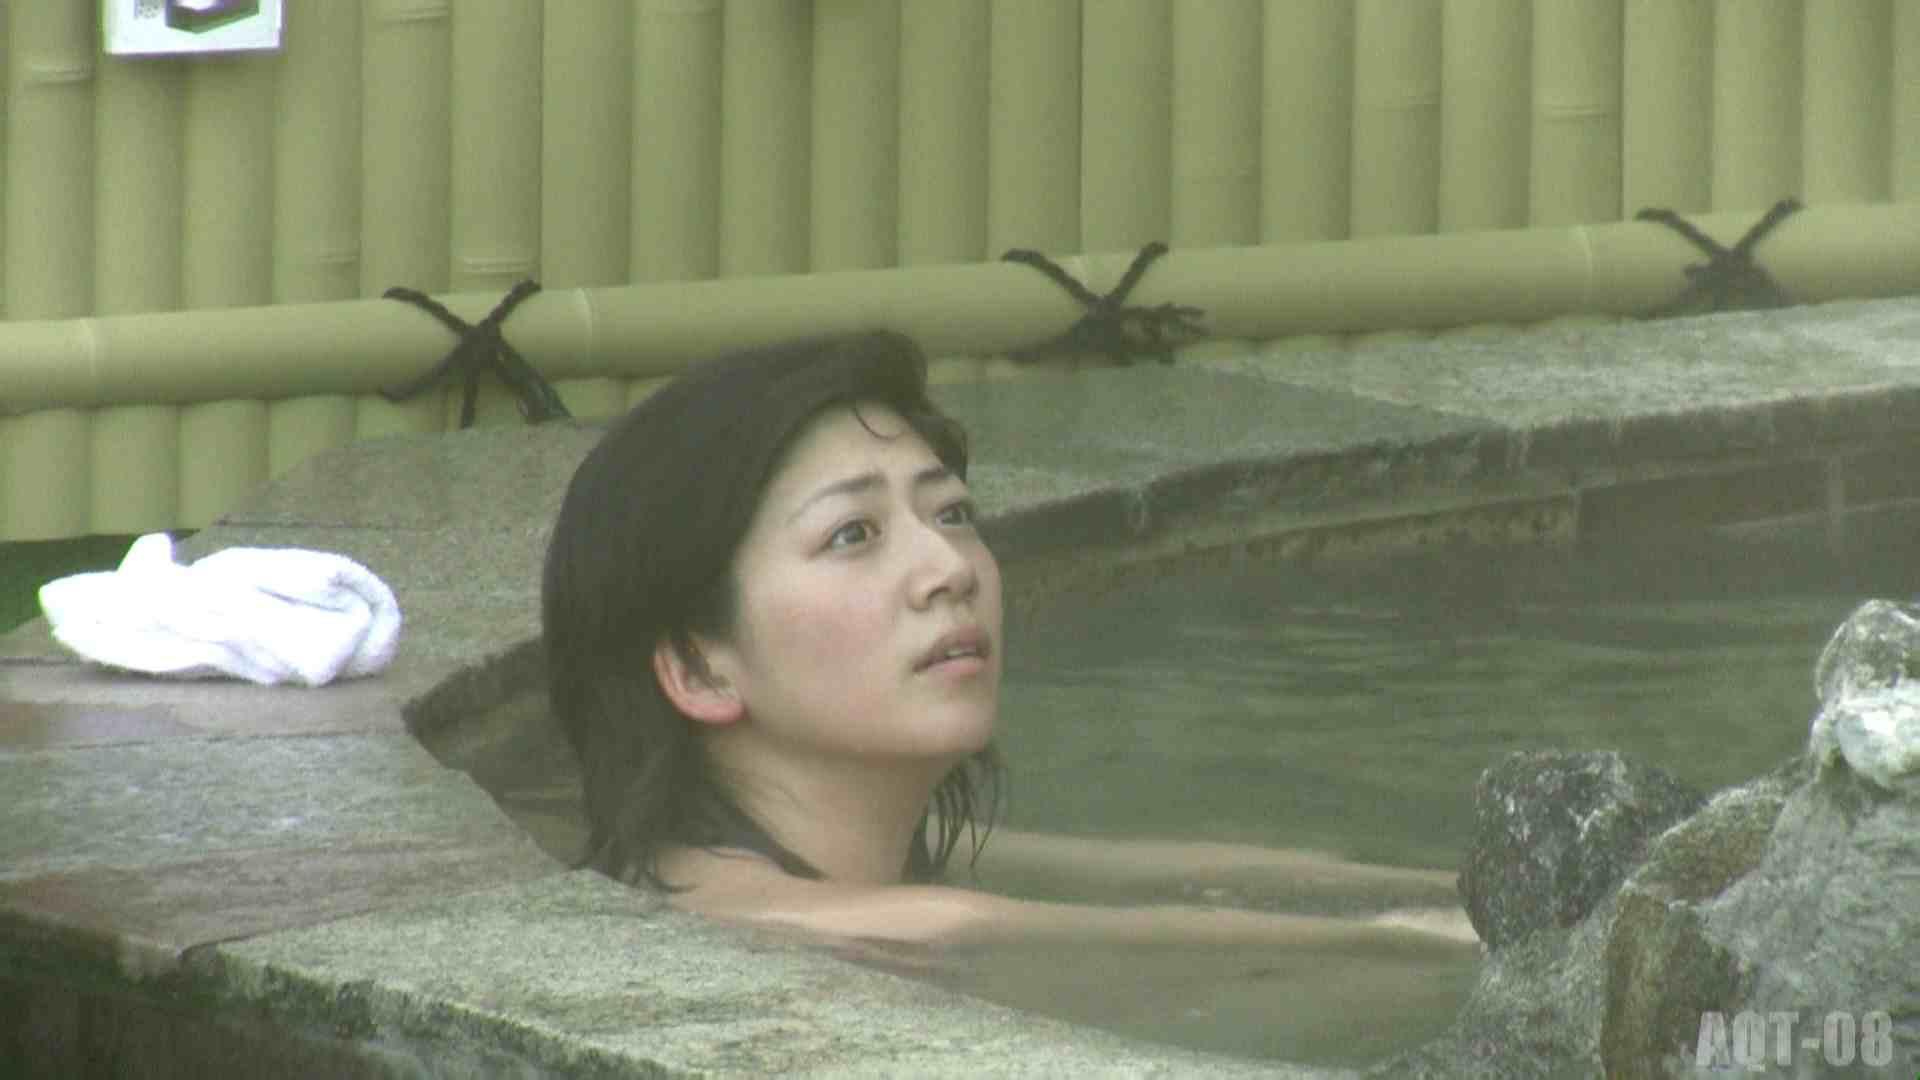 Aquaな露天風呂Vol.776 盗撮 エロ無料画像 108画像 107